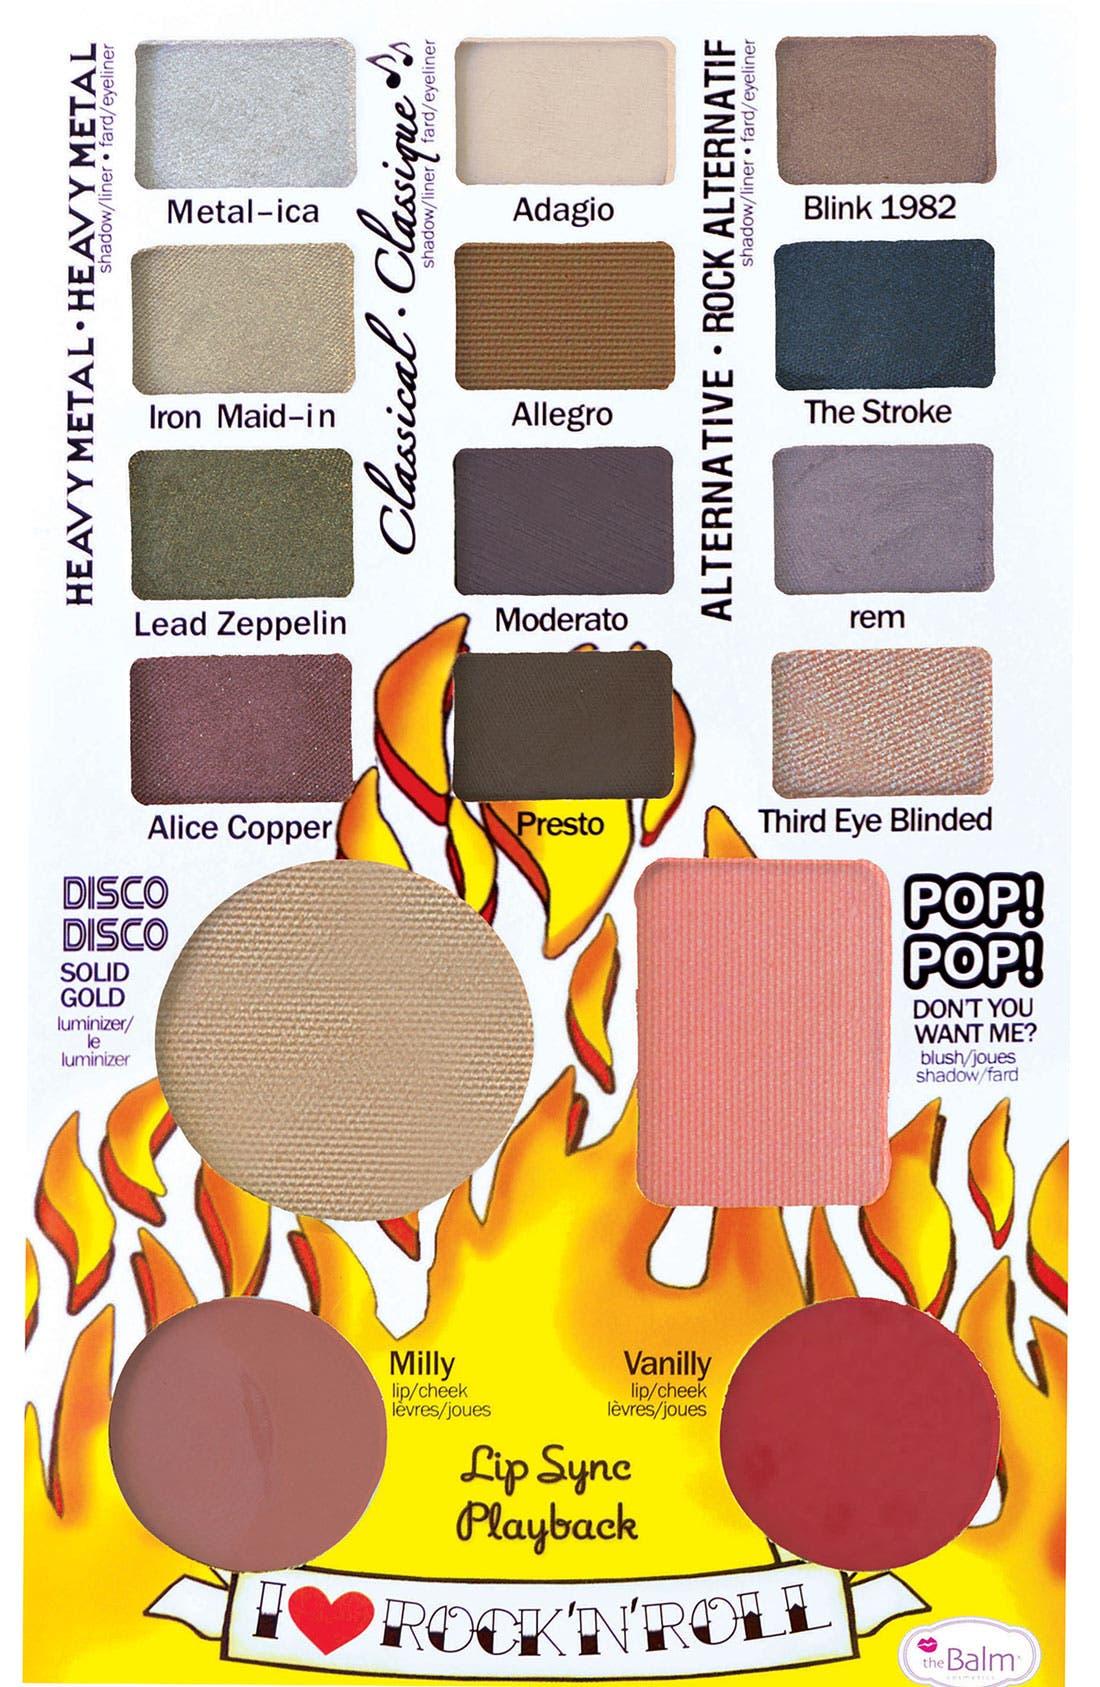 Alternate Image 1 Selected - theBalm 'Balm Jovi Rockstar' Face Palette